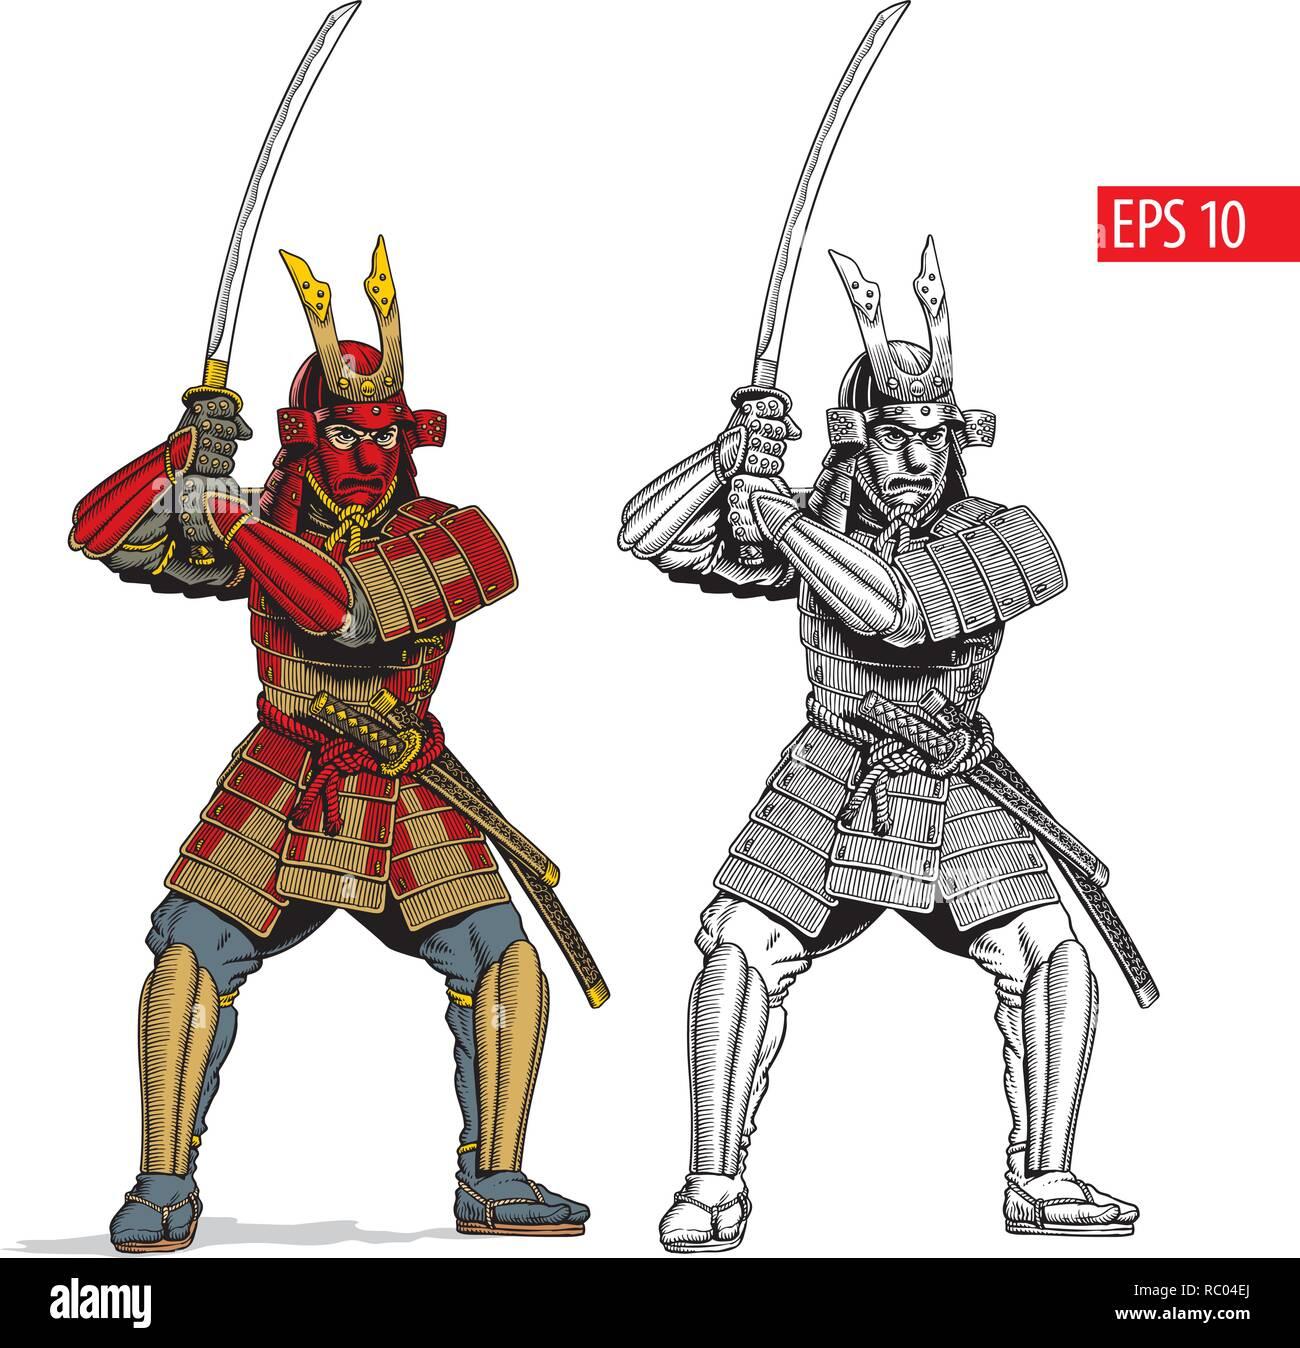 Samurai In Ancient Armor Japanese Warrior With Katana Sword Vector Illustration Stock Vector Image Art Alamy